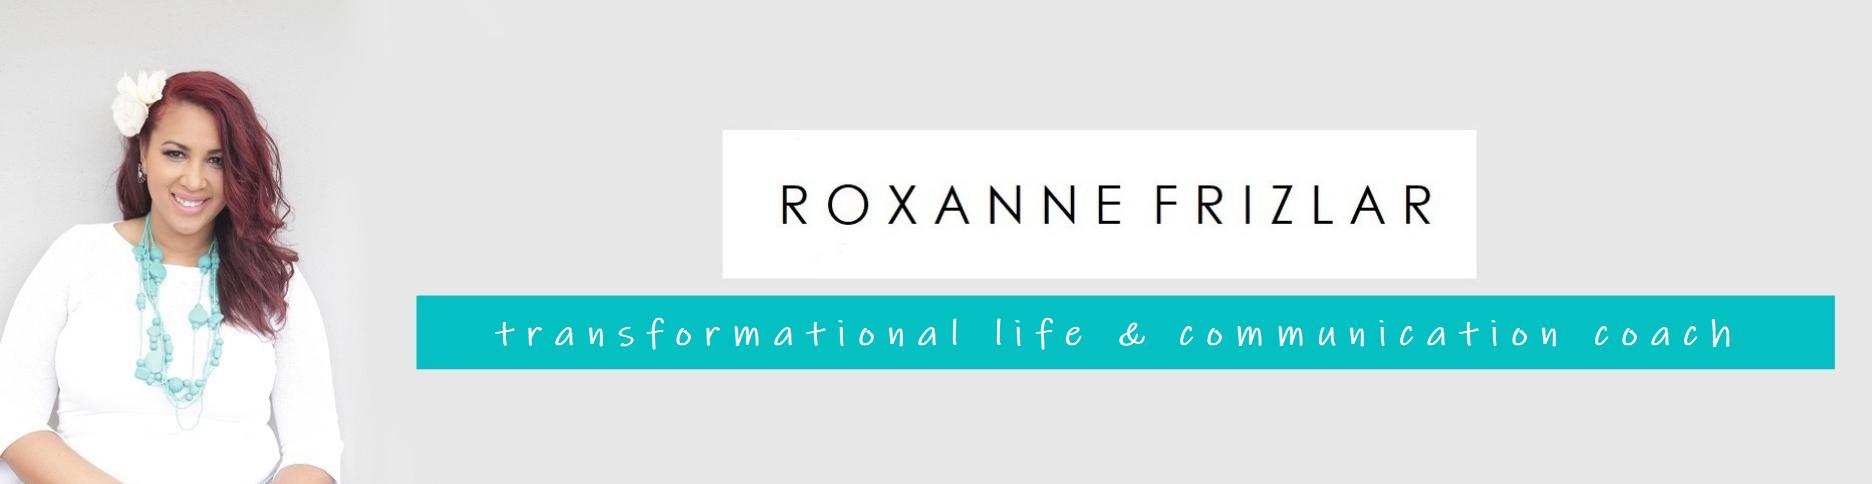 Roxanne Frizlar – Transformational Life & Communication Coach